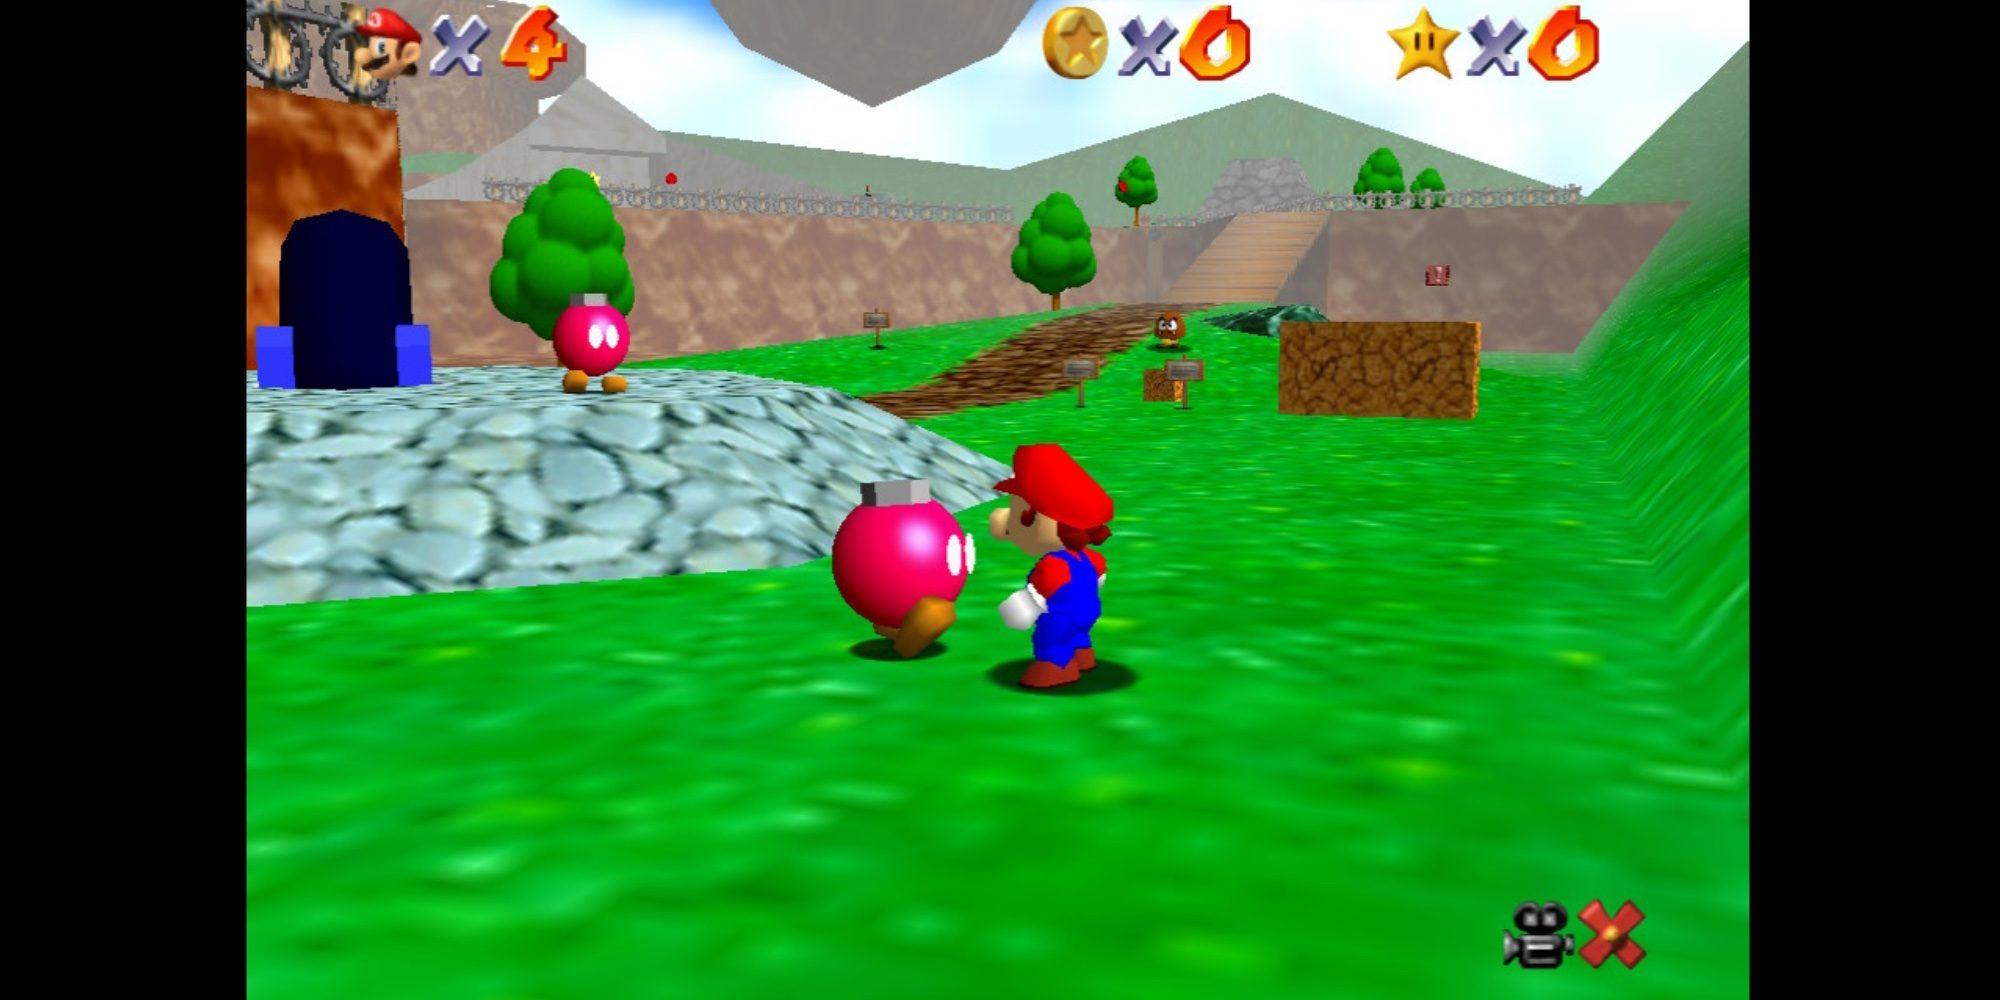 Super Mario All-Stars Review